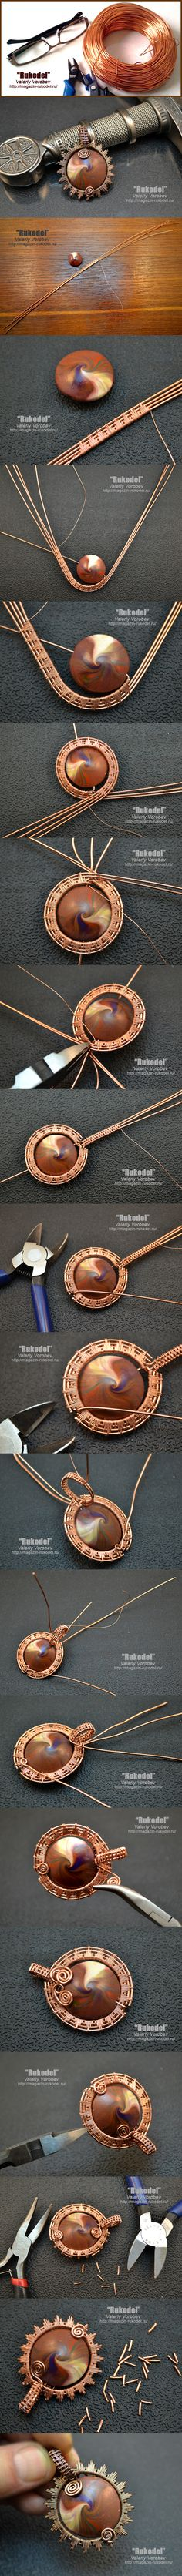 Поделки, украшения из проволоки своими руками. Рукодел. Wire wrap tutorial on Vorobev. Wire Wrap Pendant.  #rukodel, #Vorobev, #handmade, #wirewrap, #wirejewelry, #wirewrapped, #Jewelry, #tutorial, #WireWrapping, #Рукодел